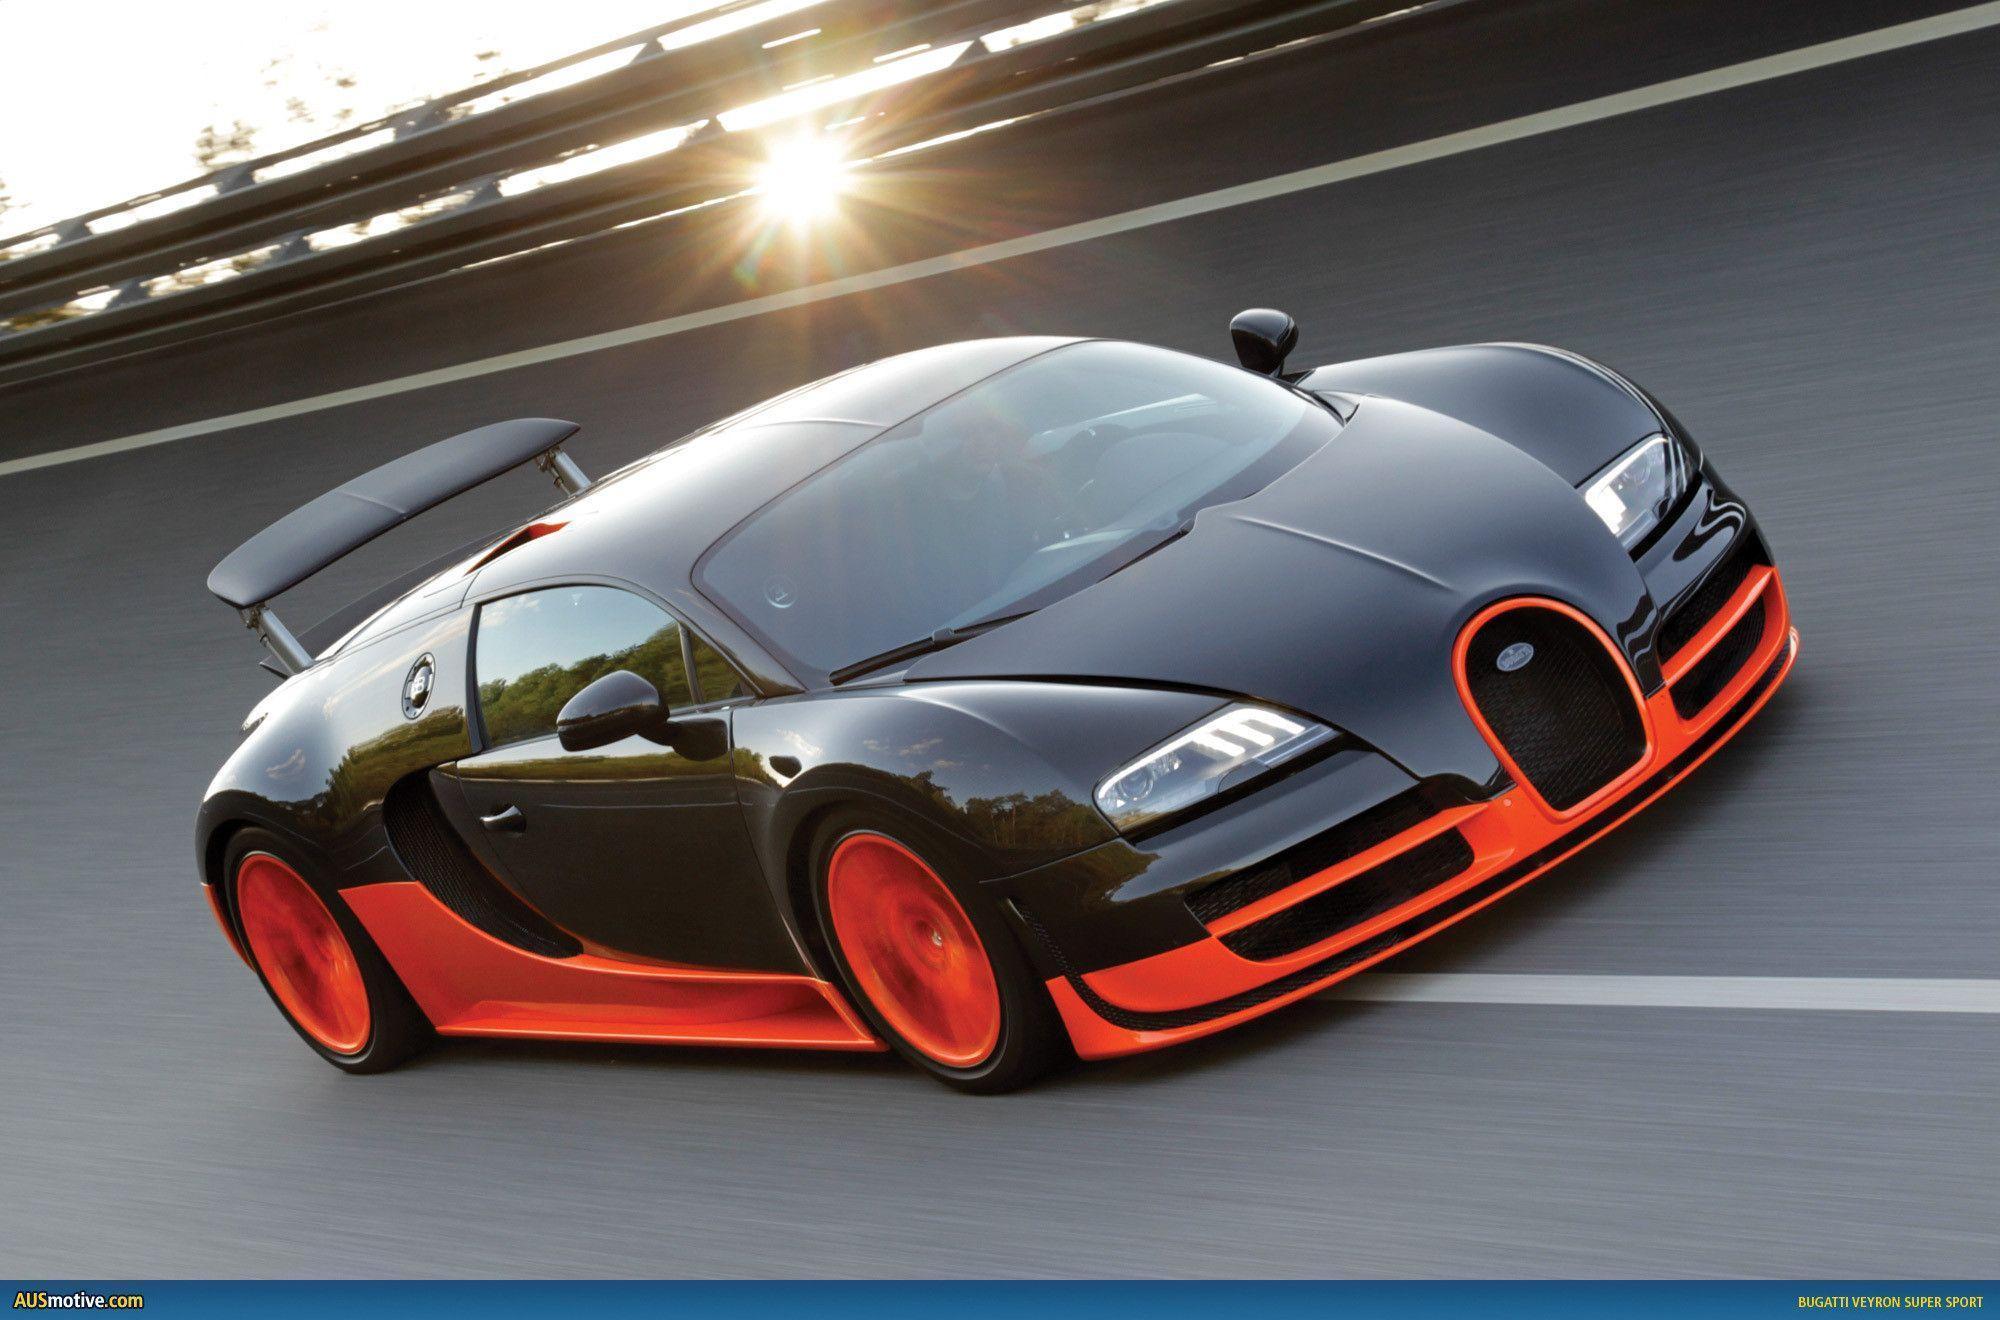 Fastest Car In The World 2015 >> Fastest Car In The World Wallpapers 2015 - Wallpaper Cave